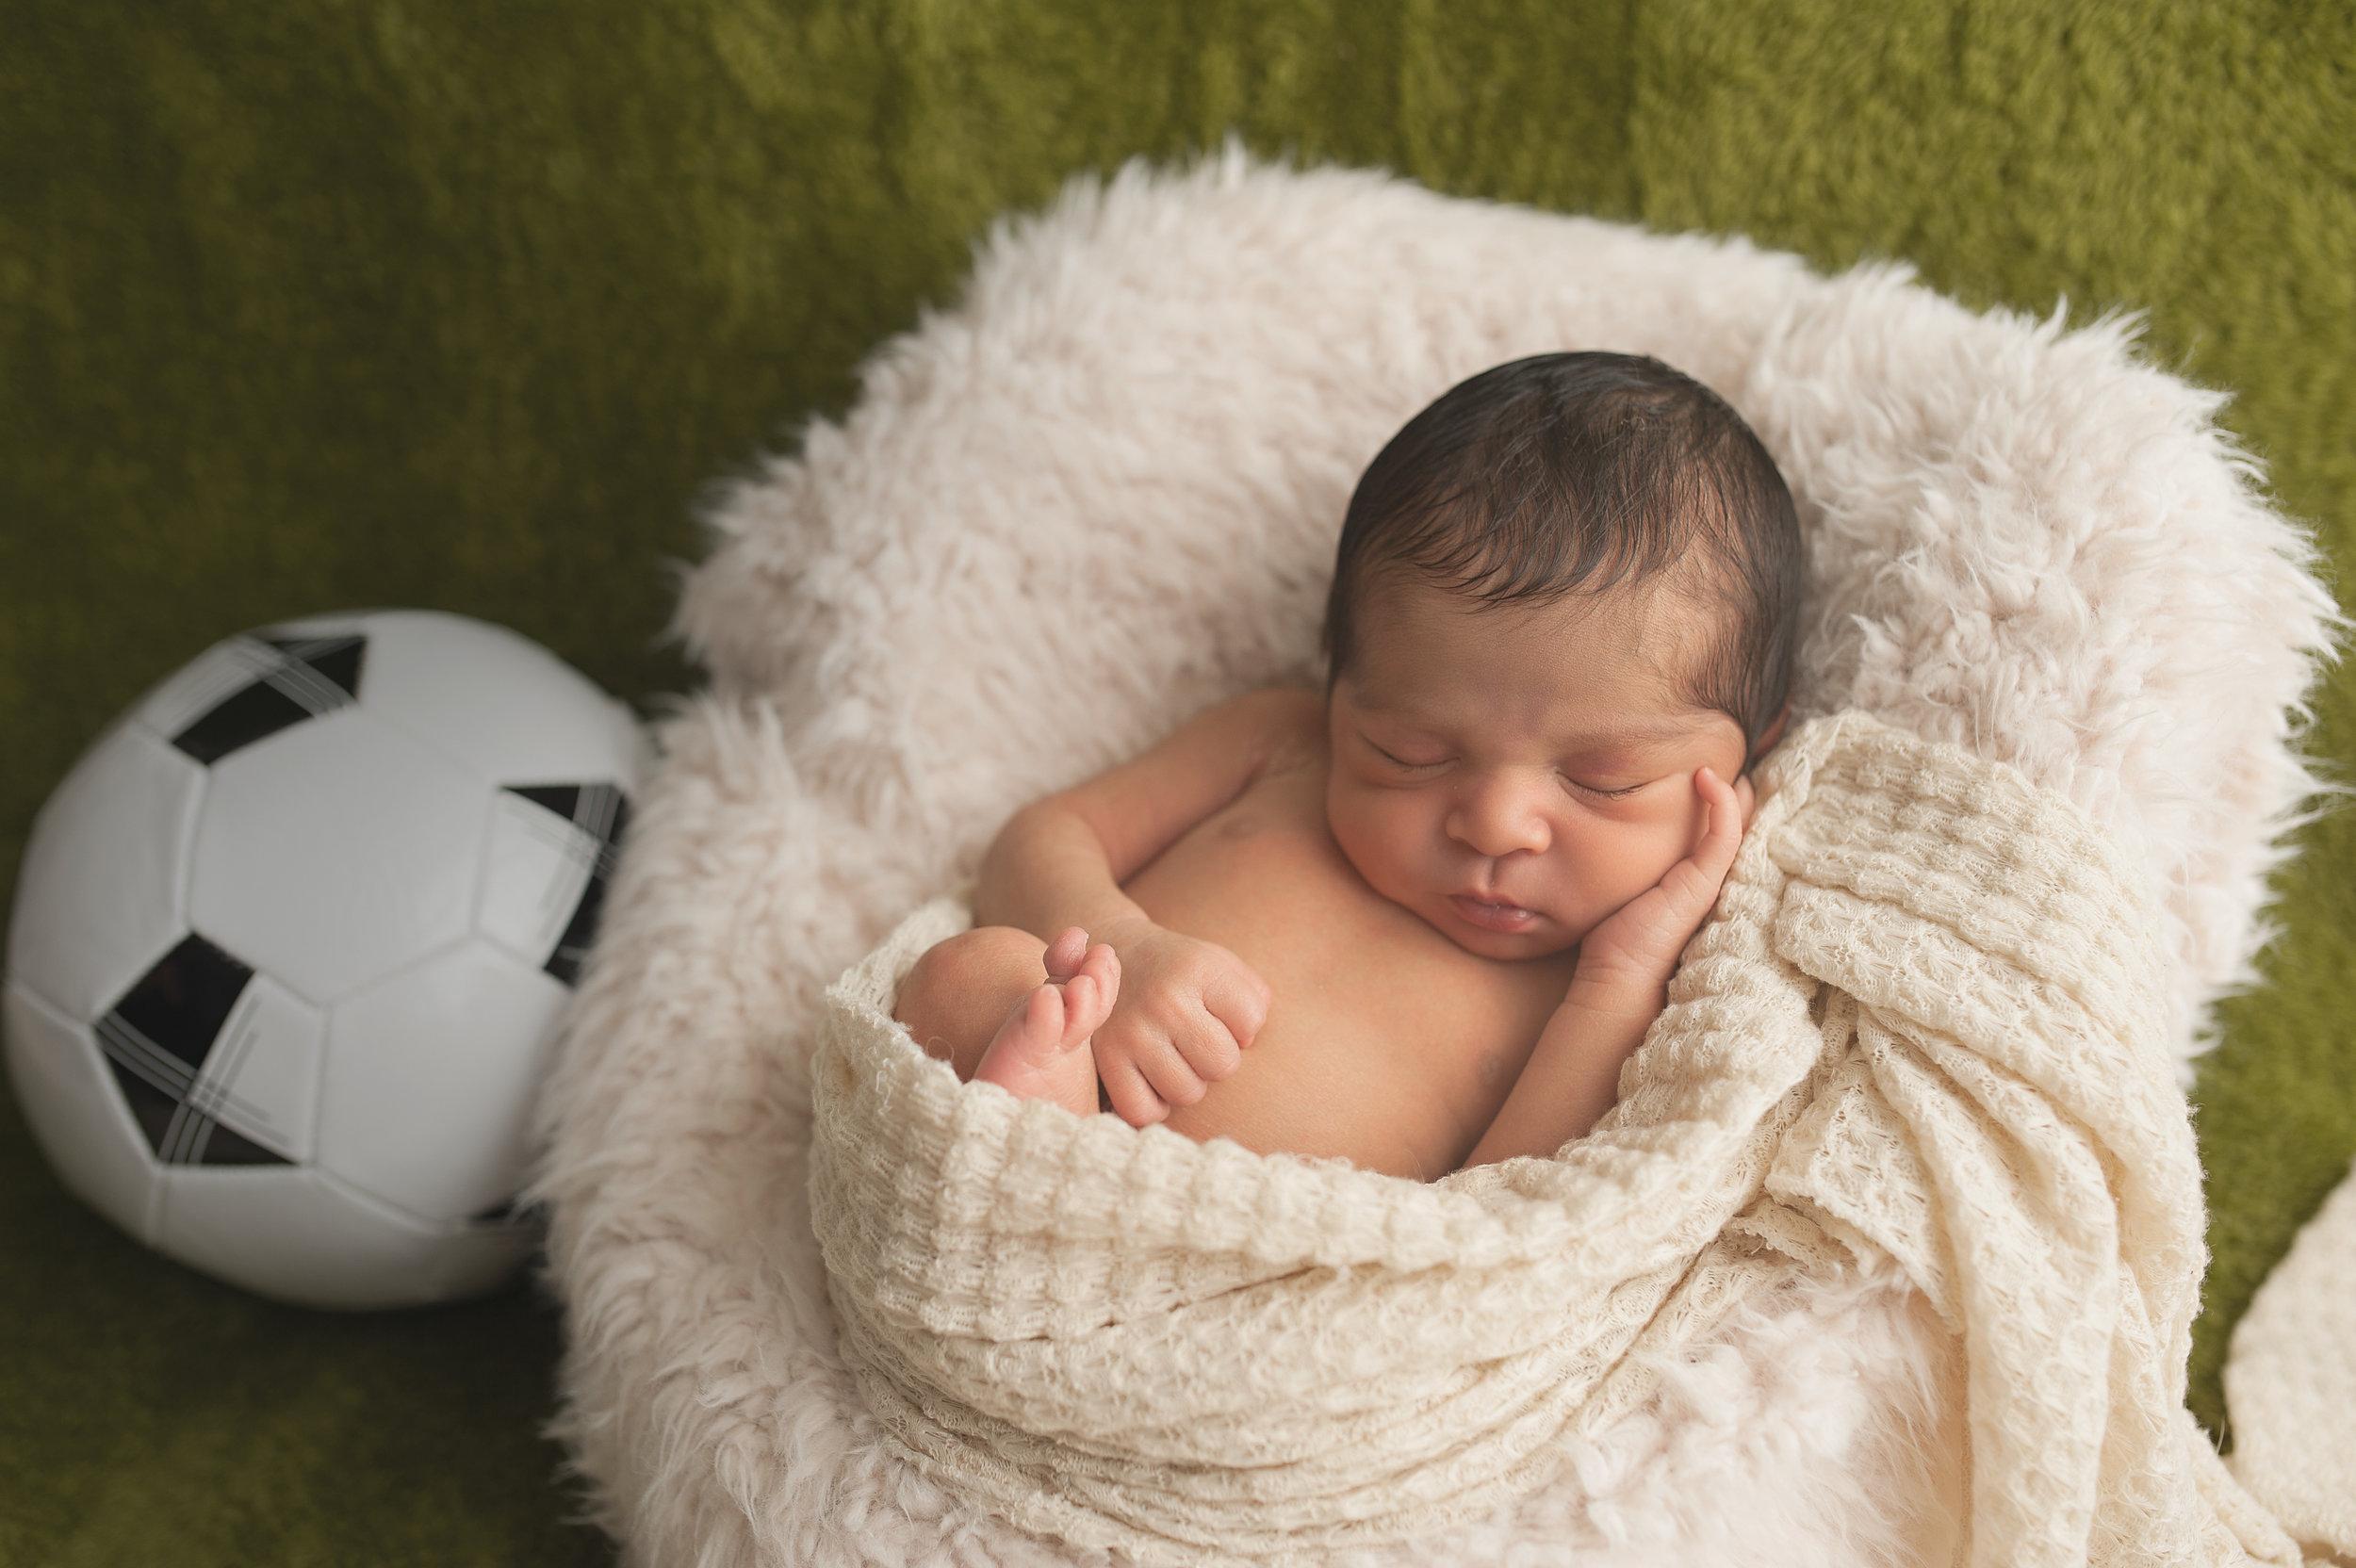 babyJgainesvillegeorgiaphotographer (3).jpg